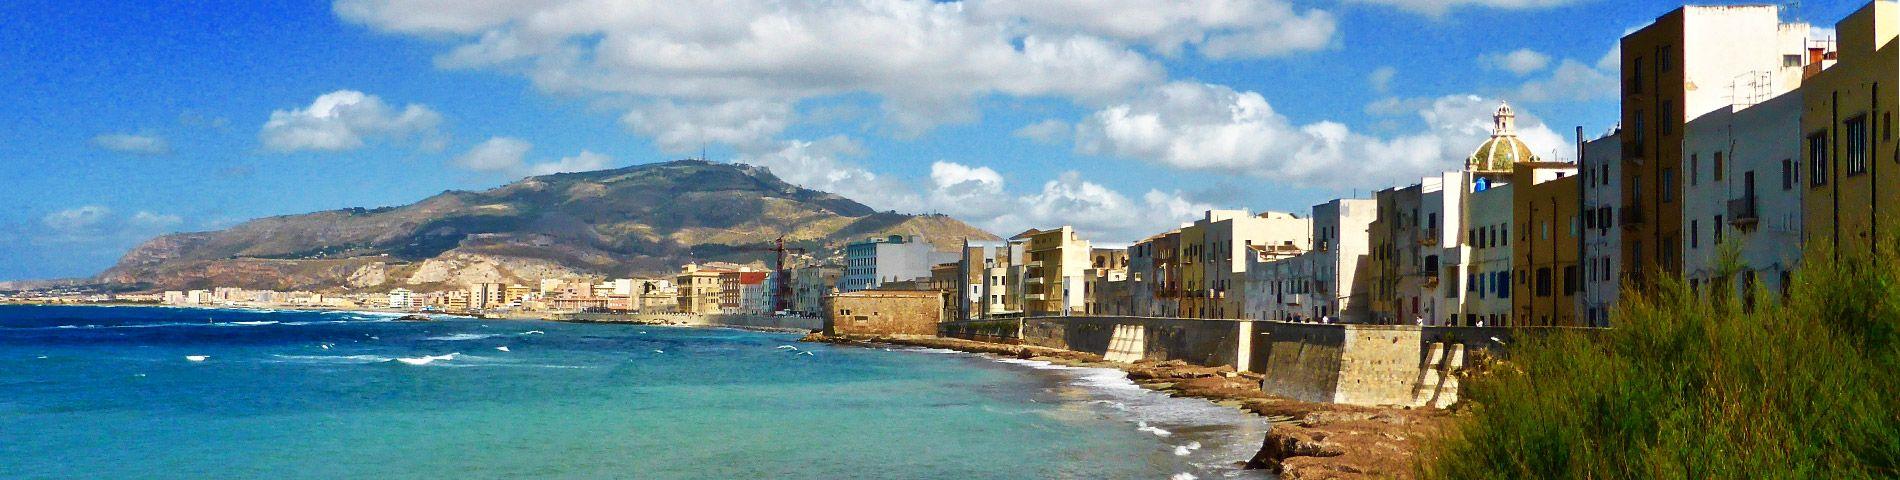 Trapani (Sicília)